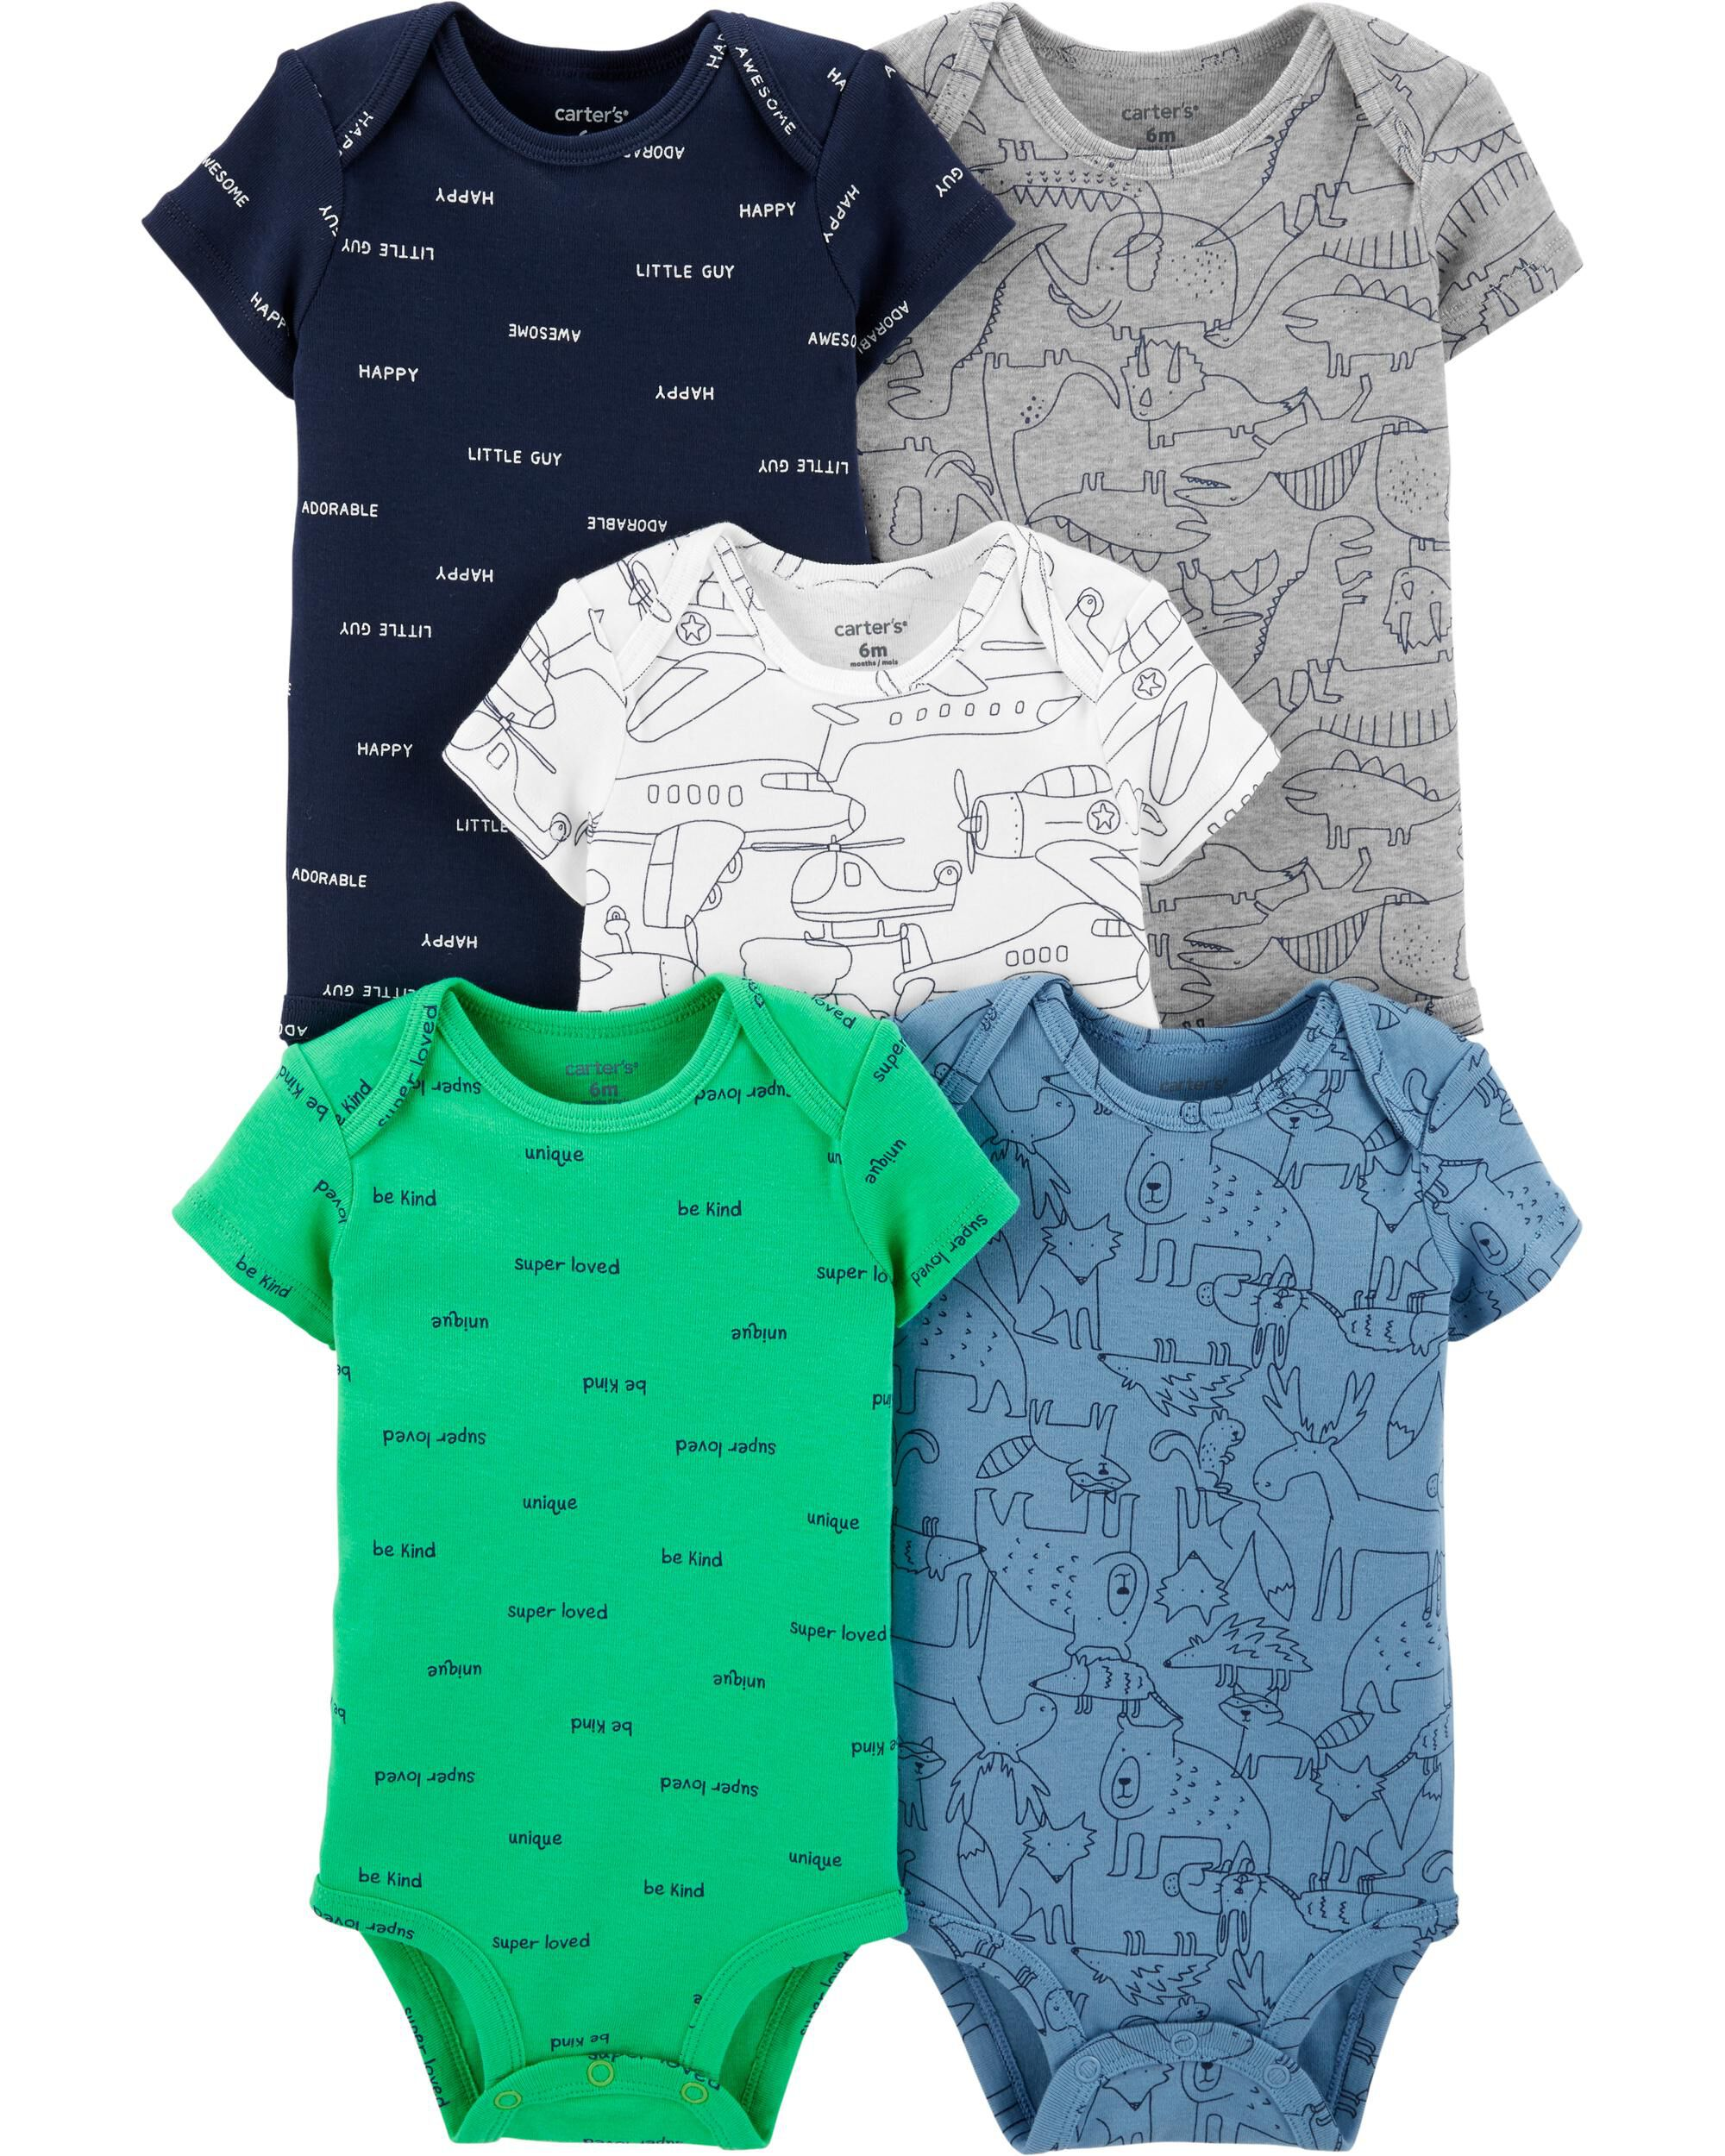 navy kids fashion 1T 2T 3T 4T 5T 3-9 m top boys toddler Pretty Fly t-shirt